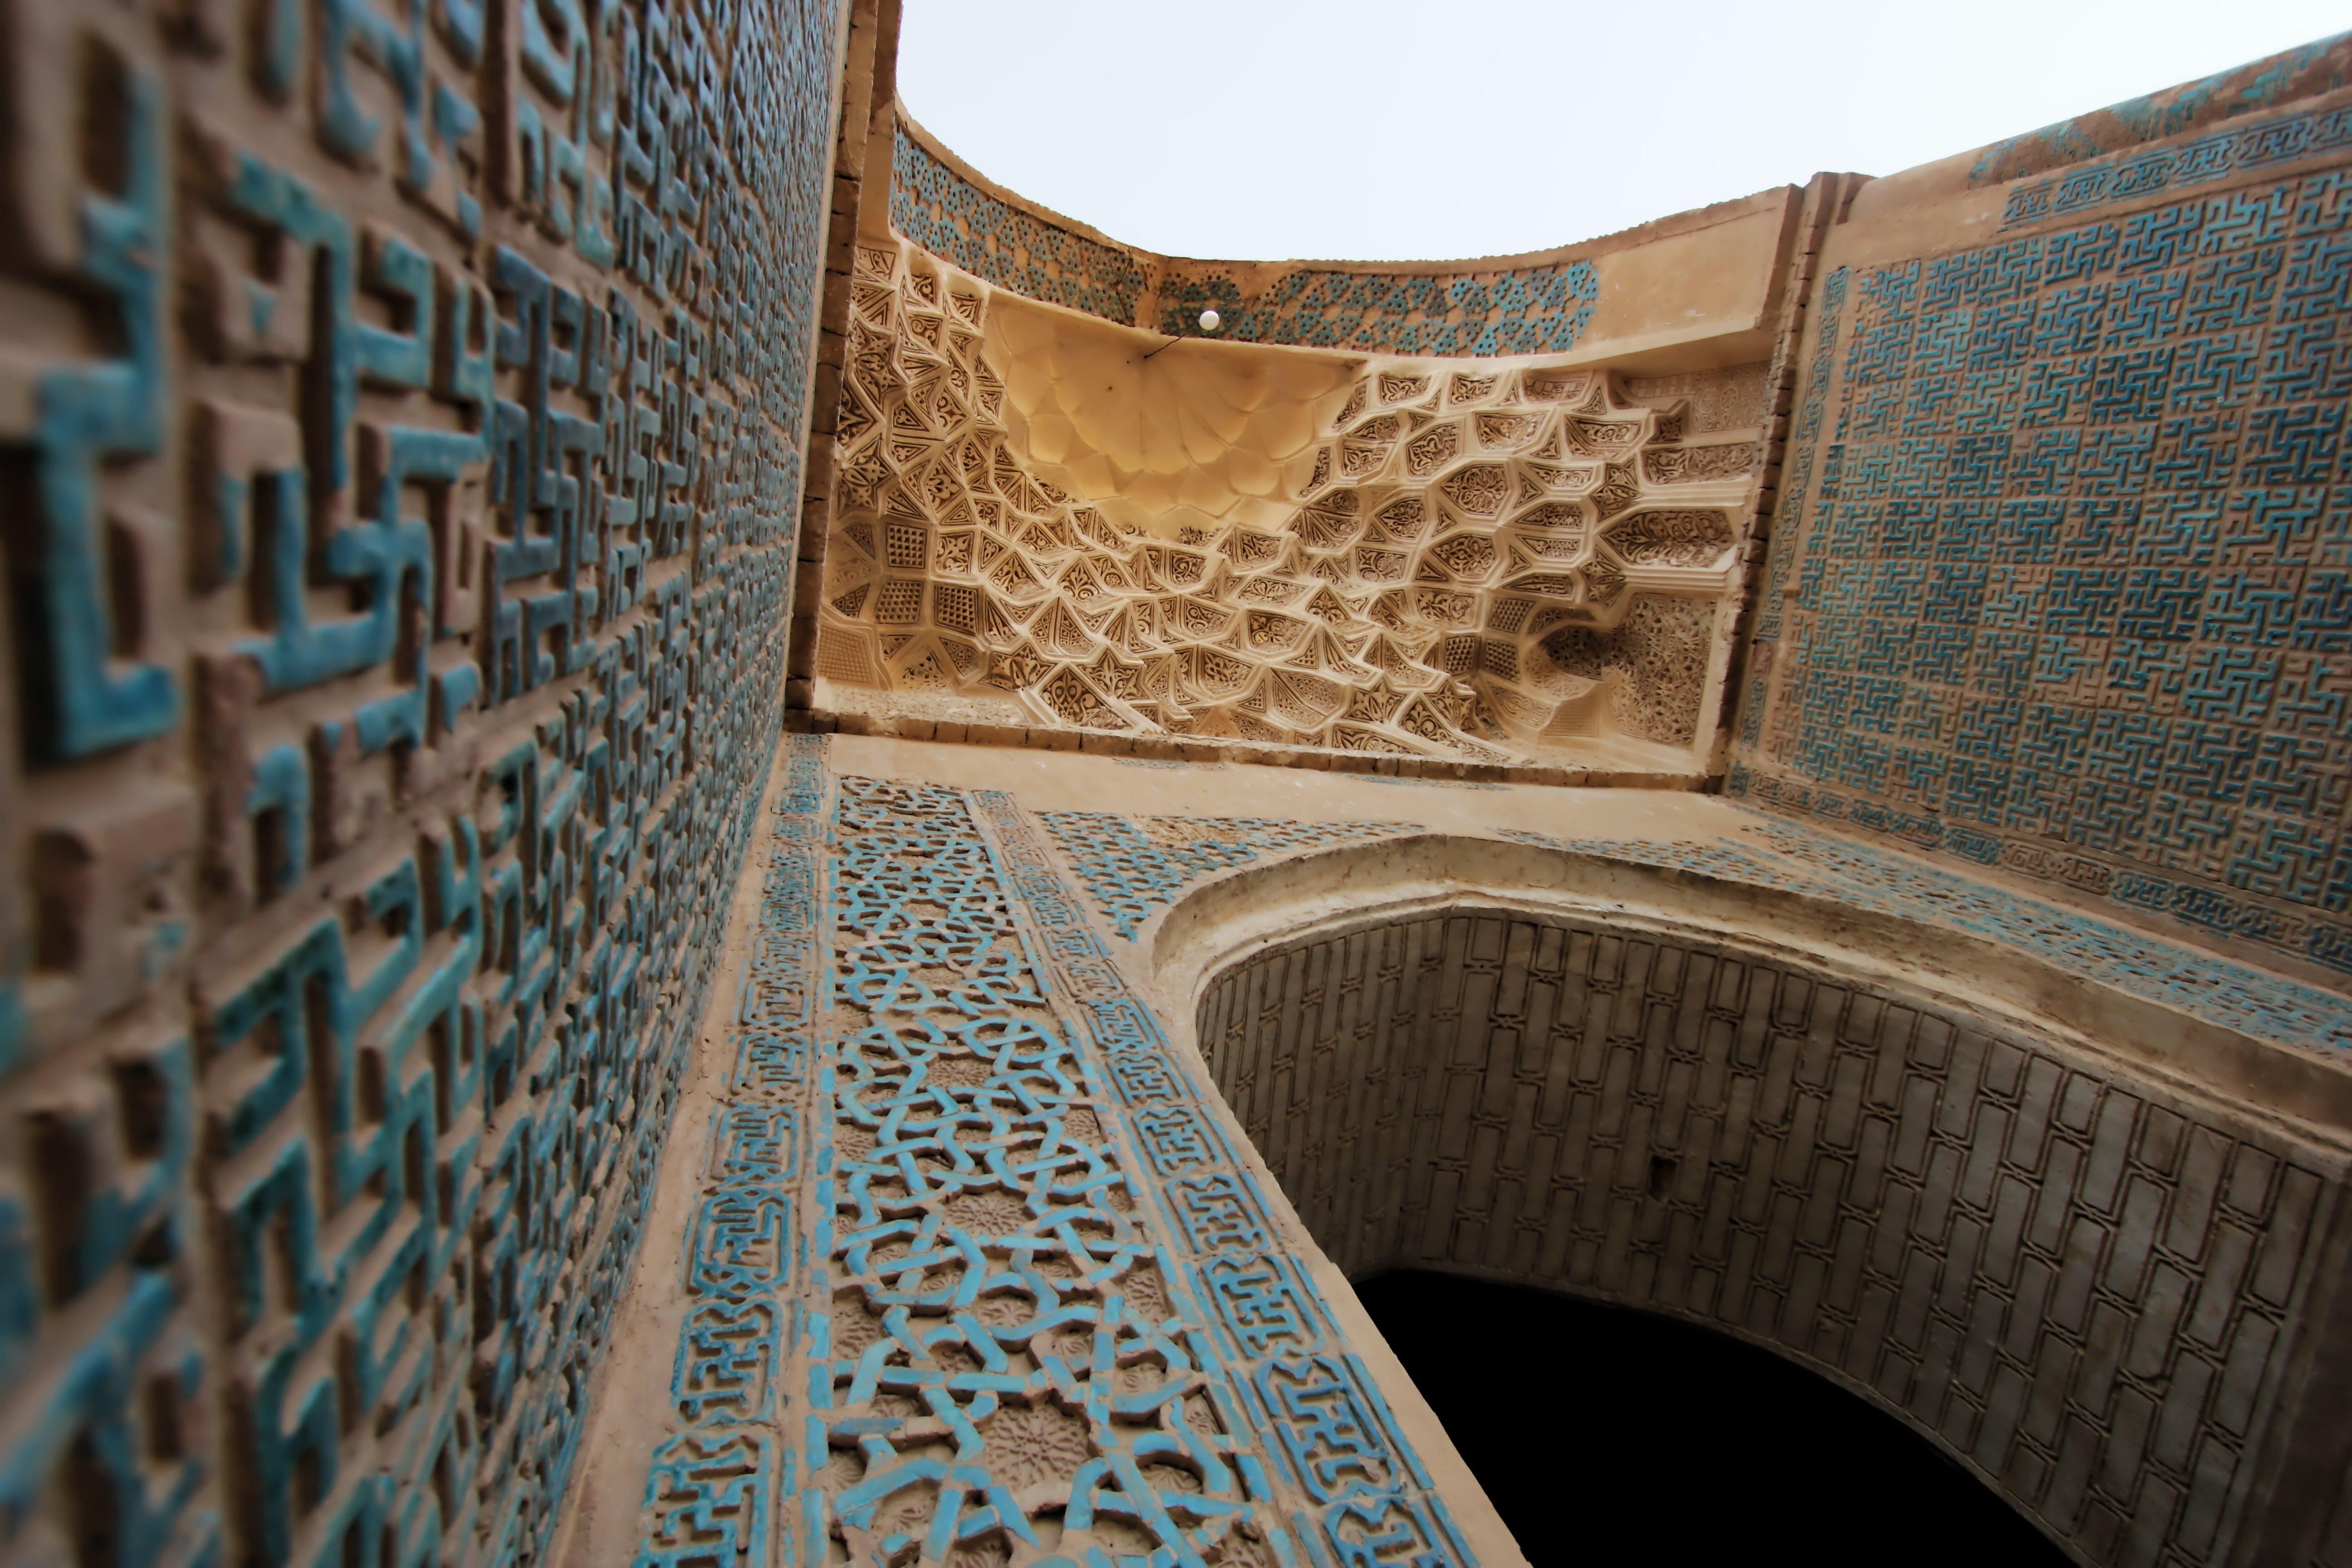 Free stock photo of Iran-Bastam 2012